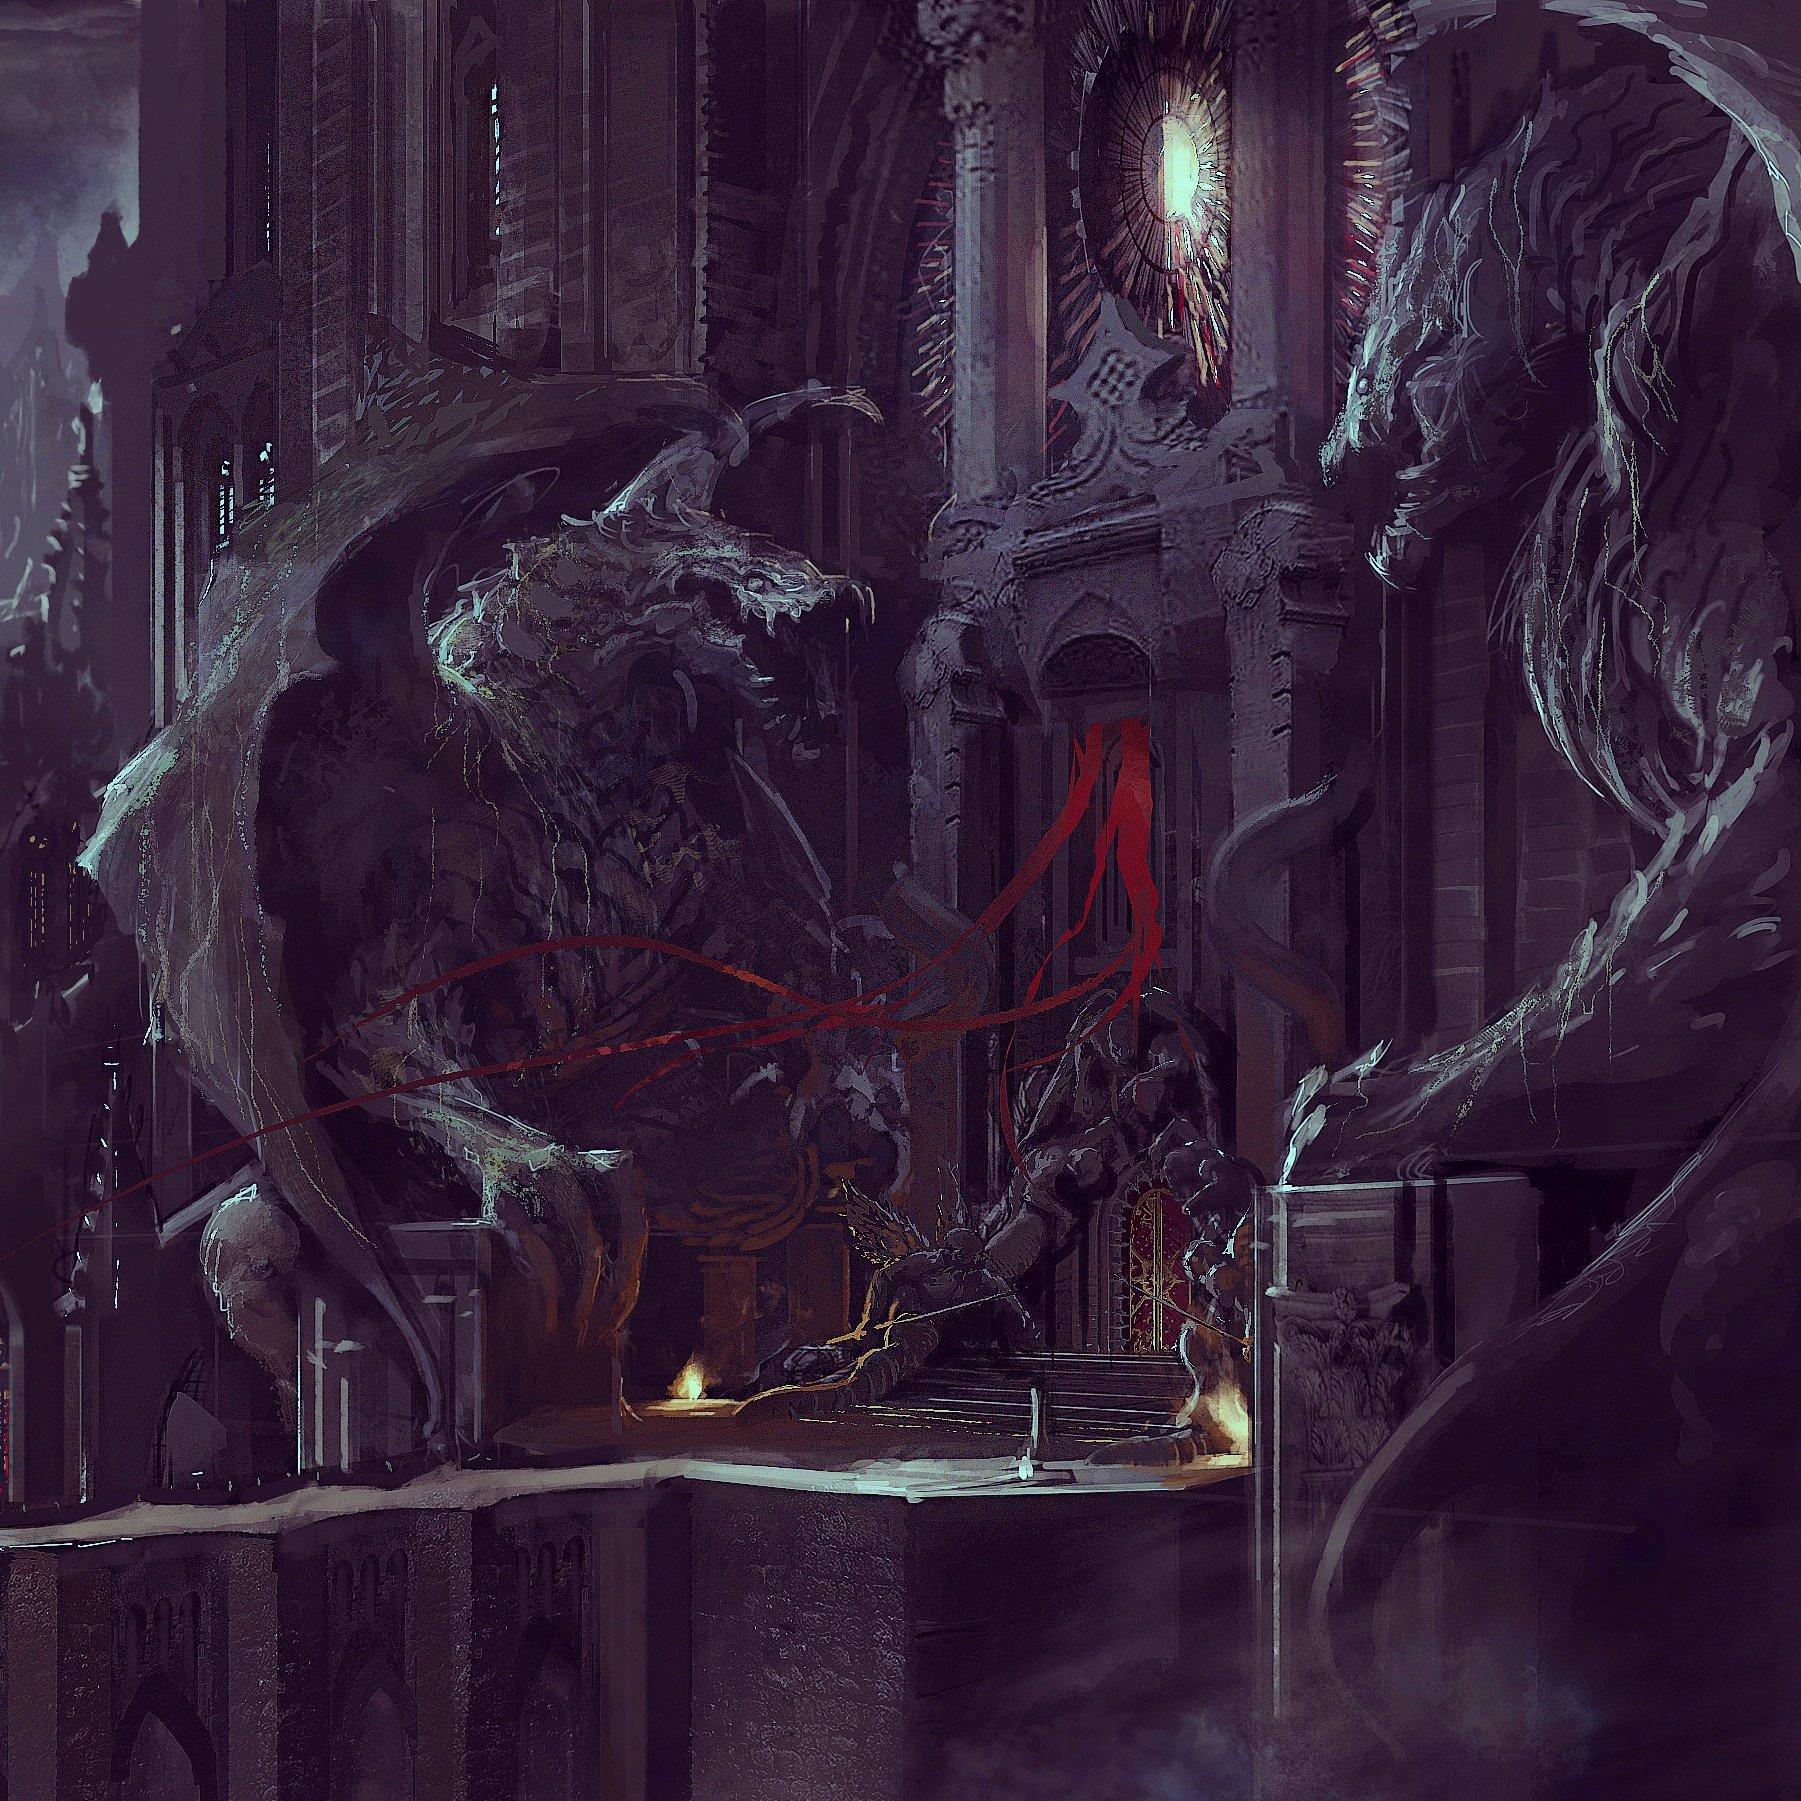 Michael_Broussard_fablehatch_digital_artist_illustration_0041.jpg